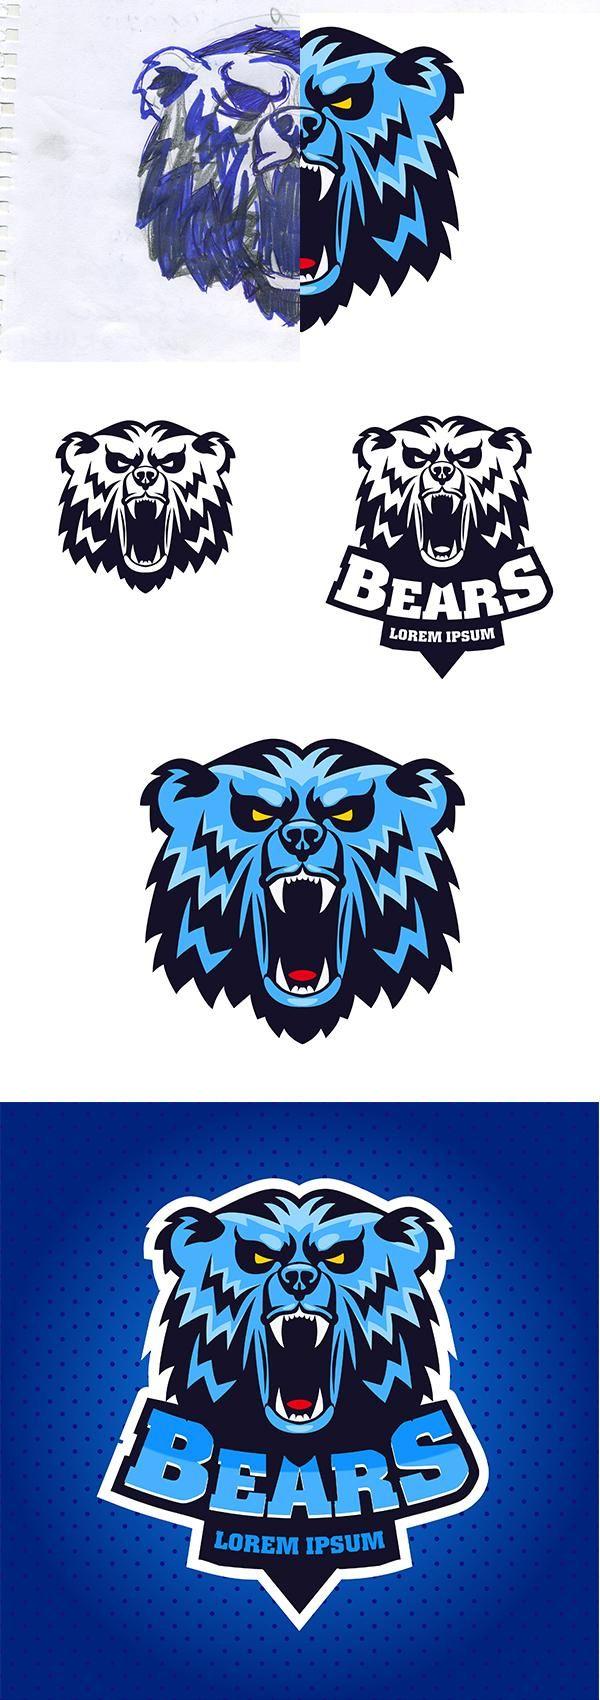 Blue Bear sports logo - image 1 - student project